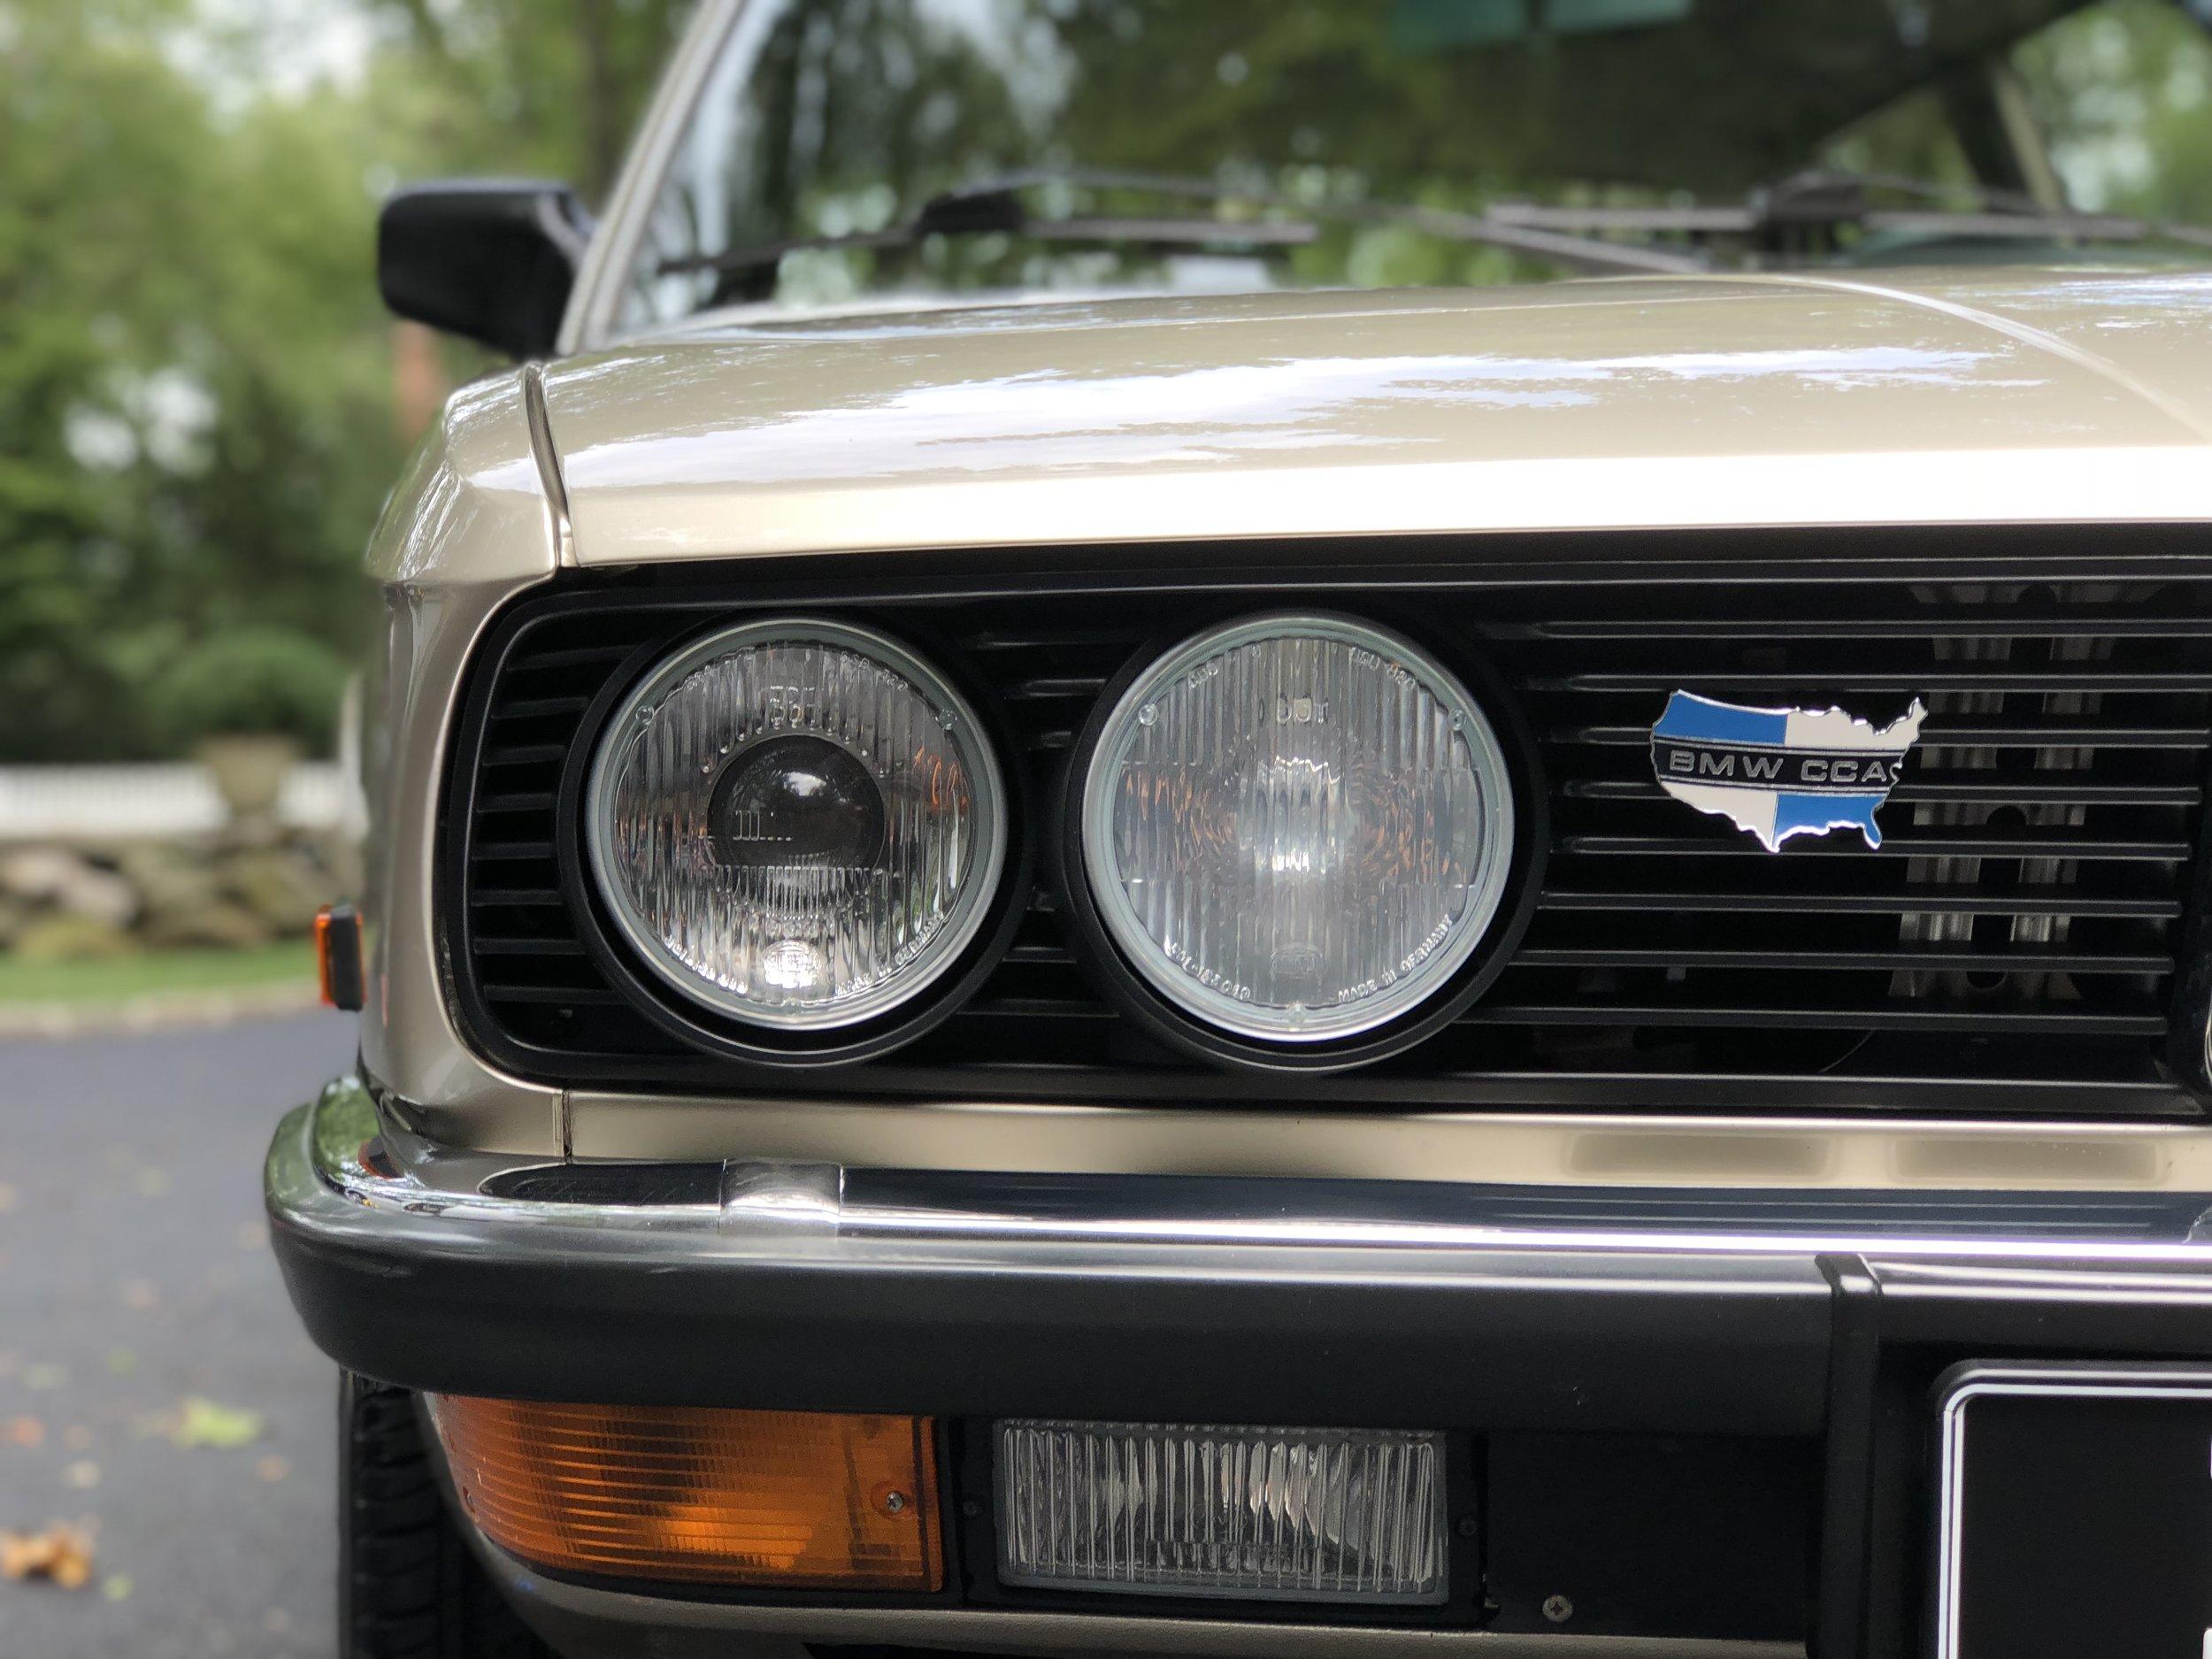 Car Detailing On BMW 520I.JPEG